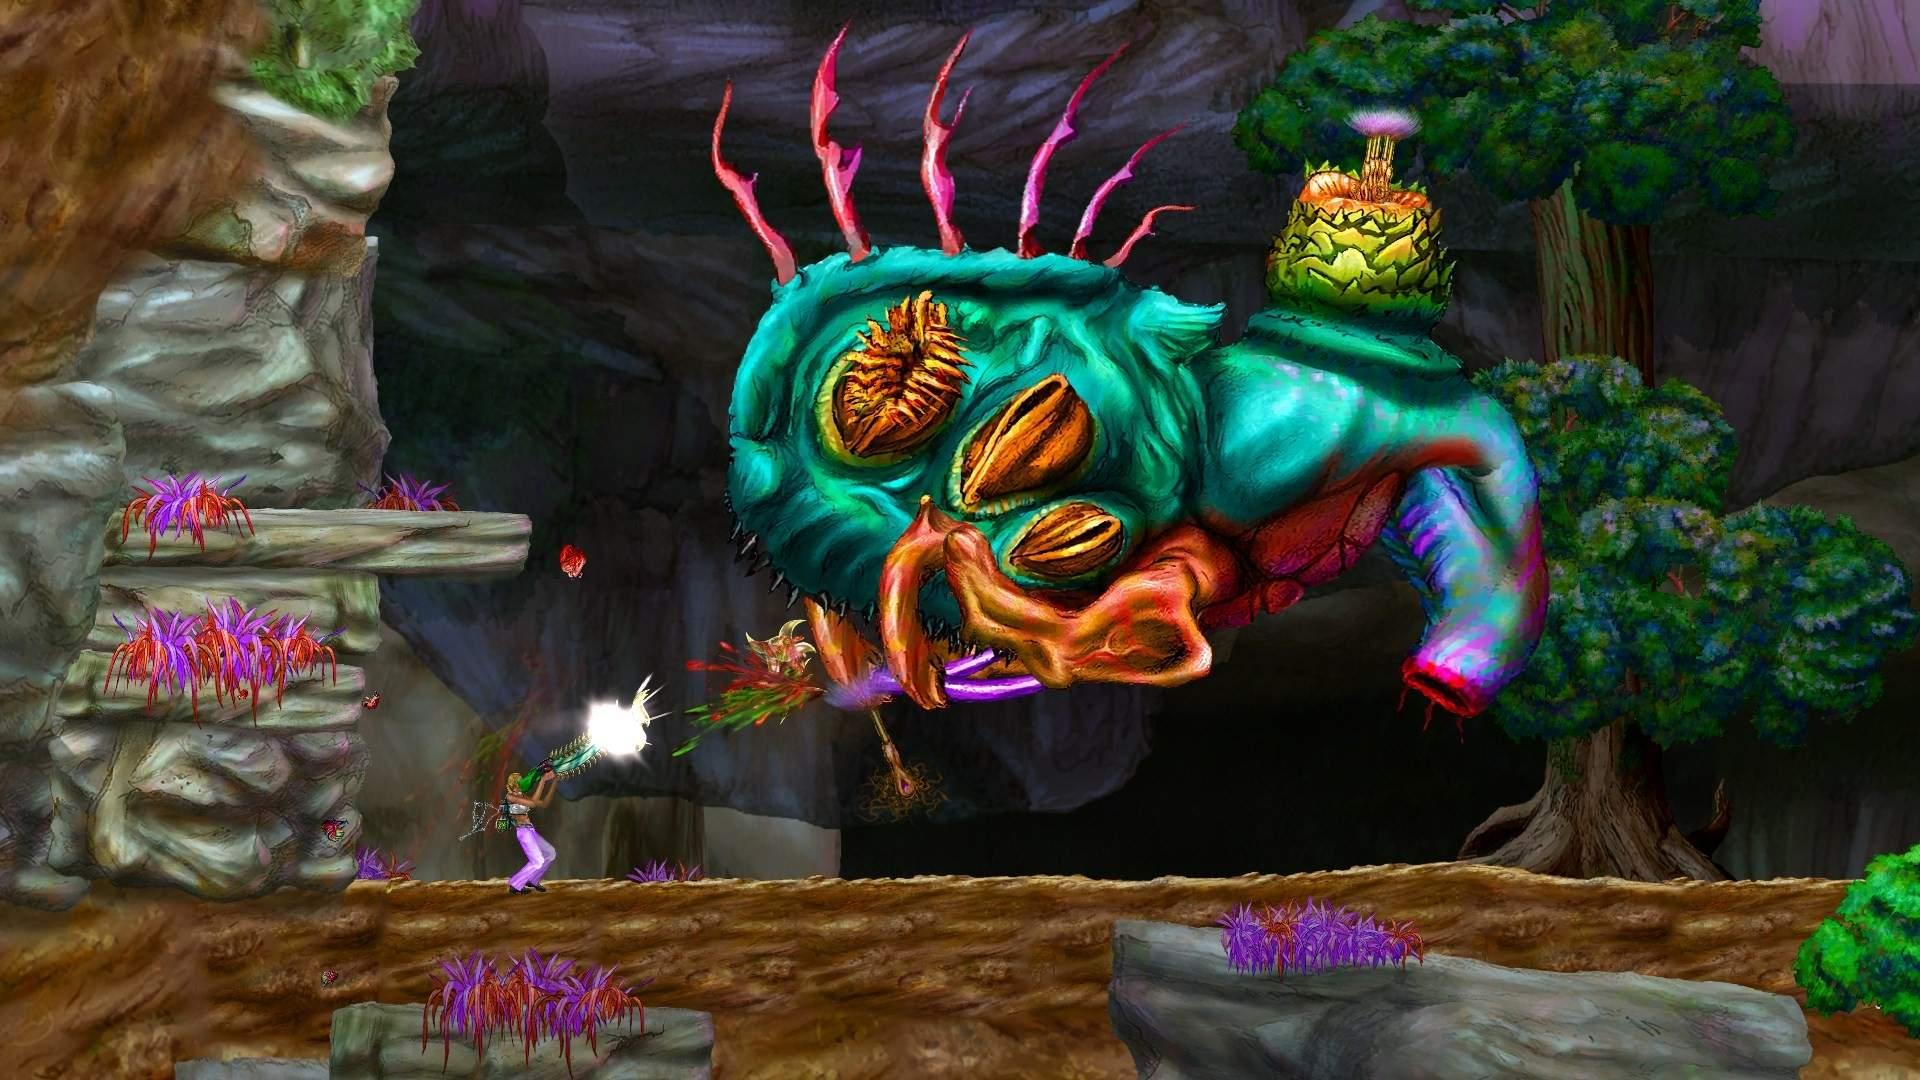 选择武器 DX - 2 月 XNUMX 日 - Xbox One X 增强